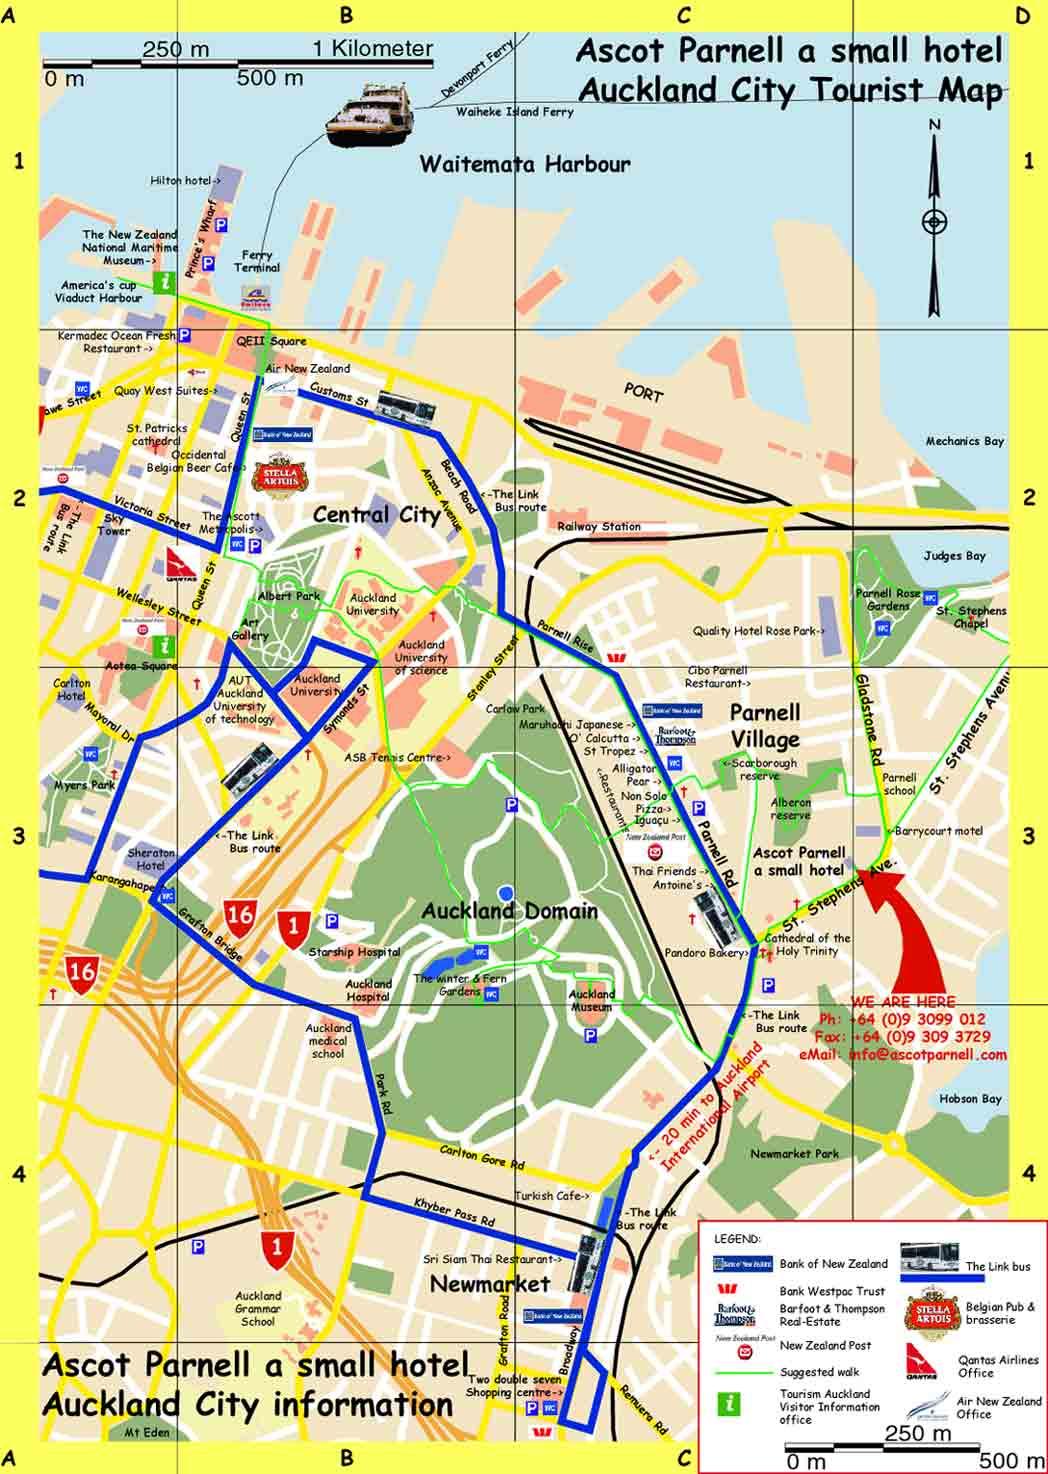 auckland tourist map parnell auckland tourist map parnell auckland